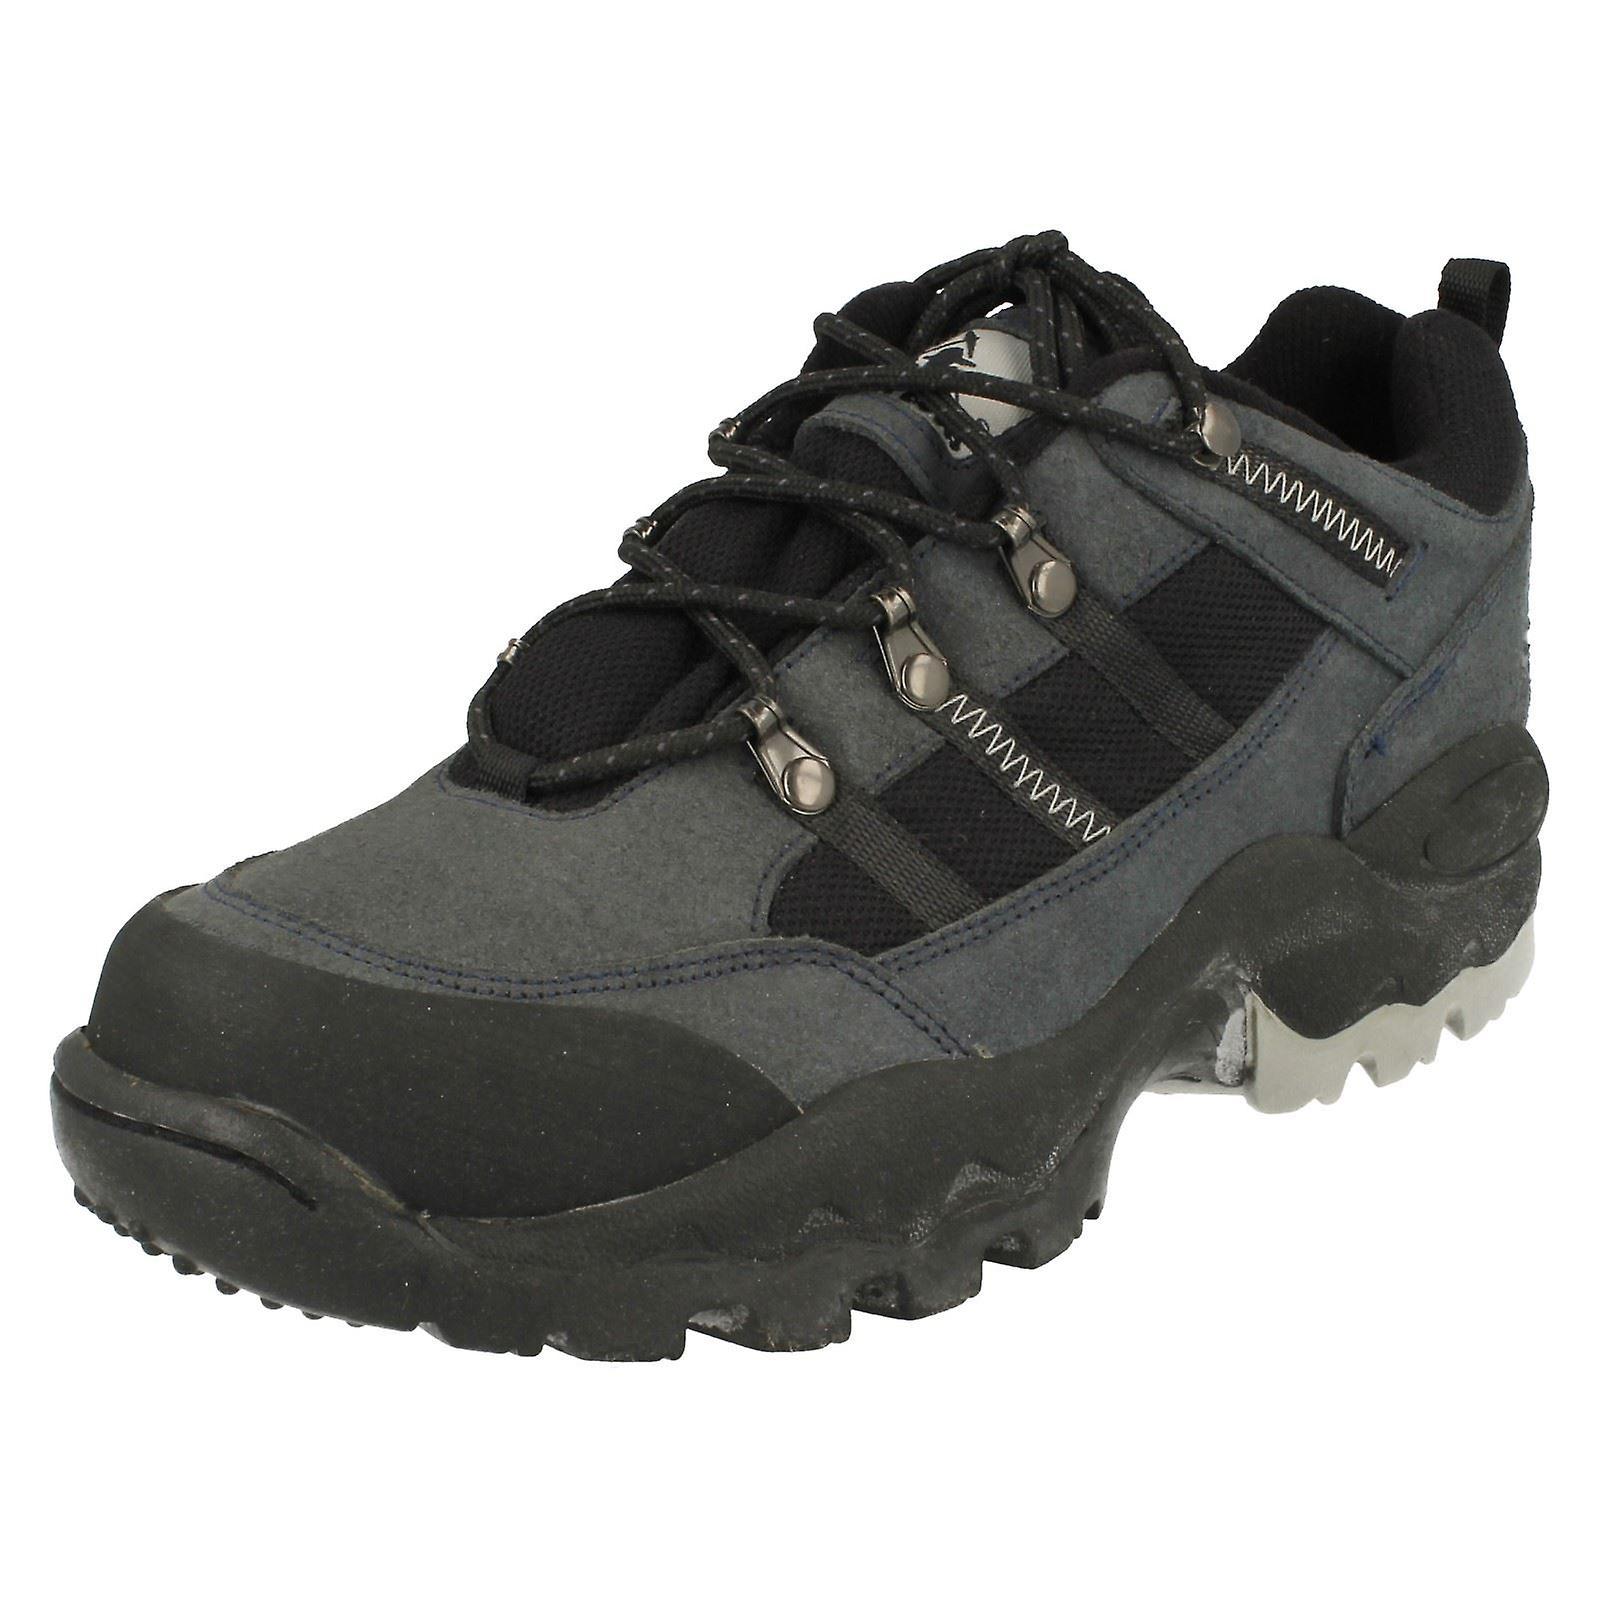 Mens Prospecta Lace Up Boots Alpine